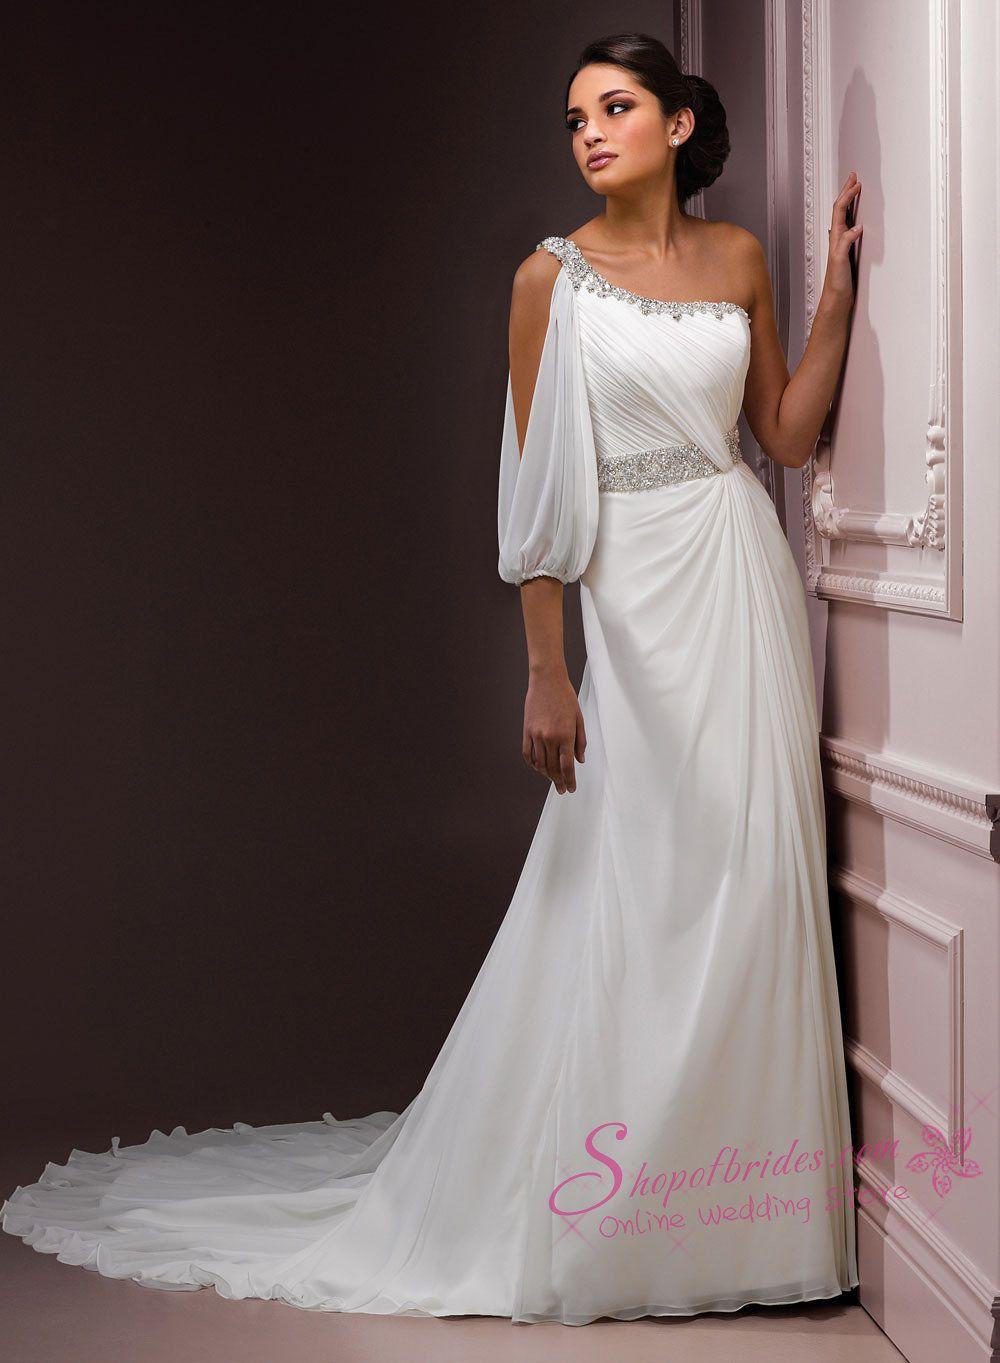 Awesome One Shoulder Wedding Dresses